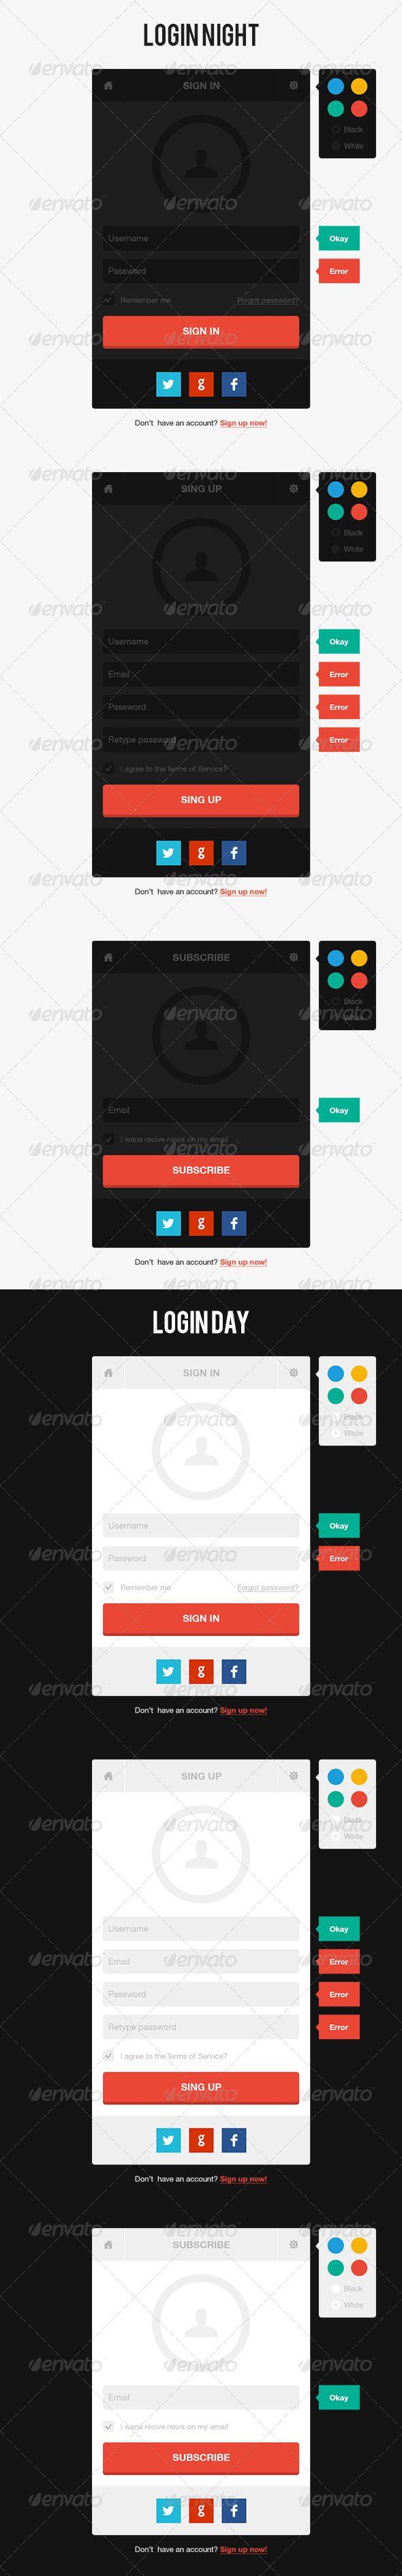 Day/Night Login Page